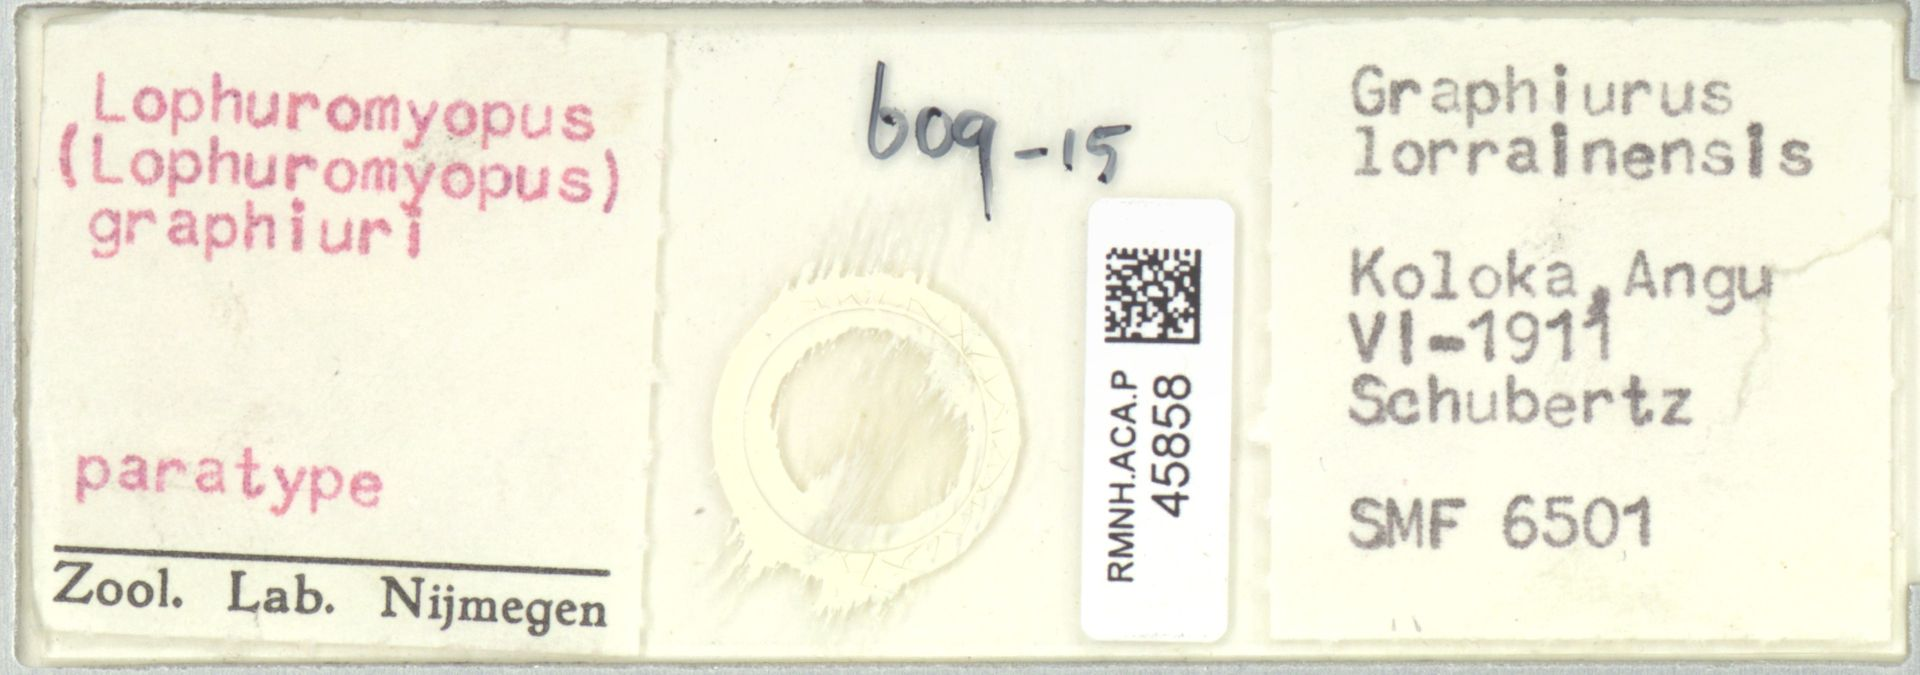 RMNH.ACA.P.45858 | Lophuromyopus (Lophuromyopus) graphiuri